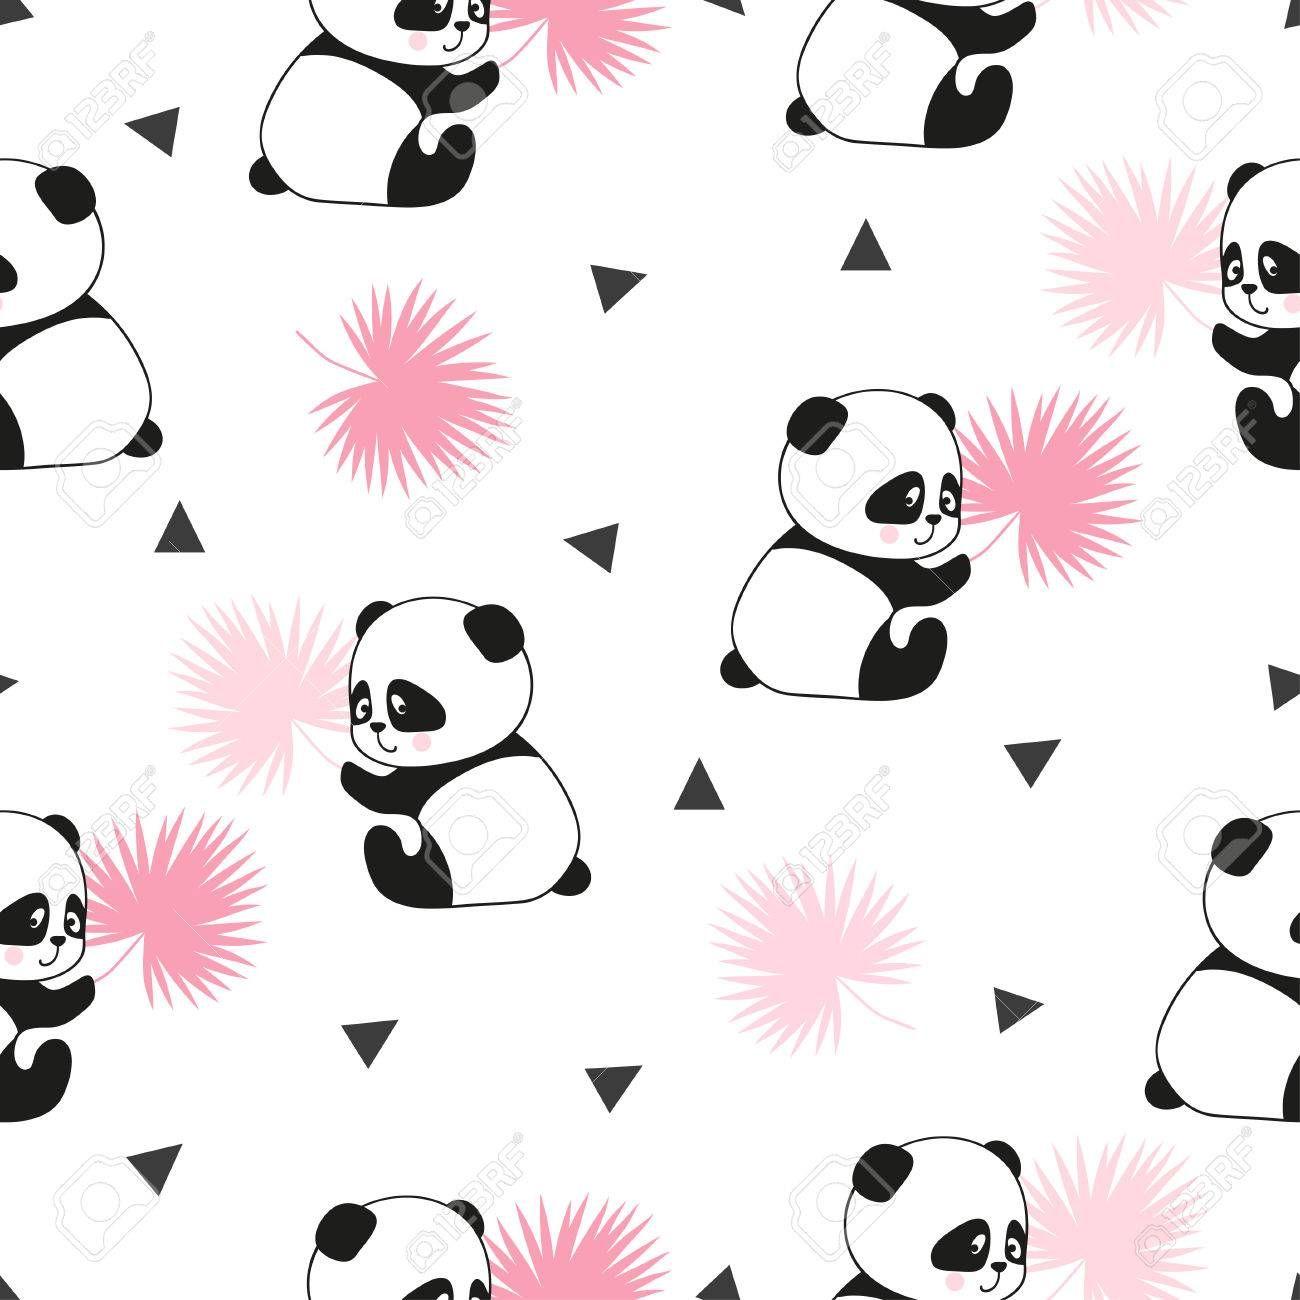 Cute Panda Wallpaper For Phone Best Hd Wallpapers Panda Background Cute Panda Wallpaper Panda Art